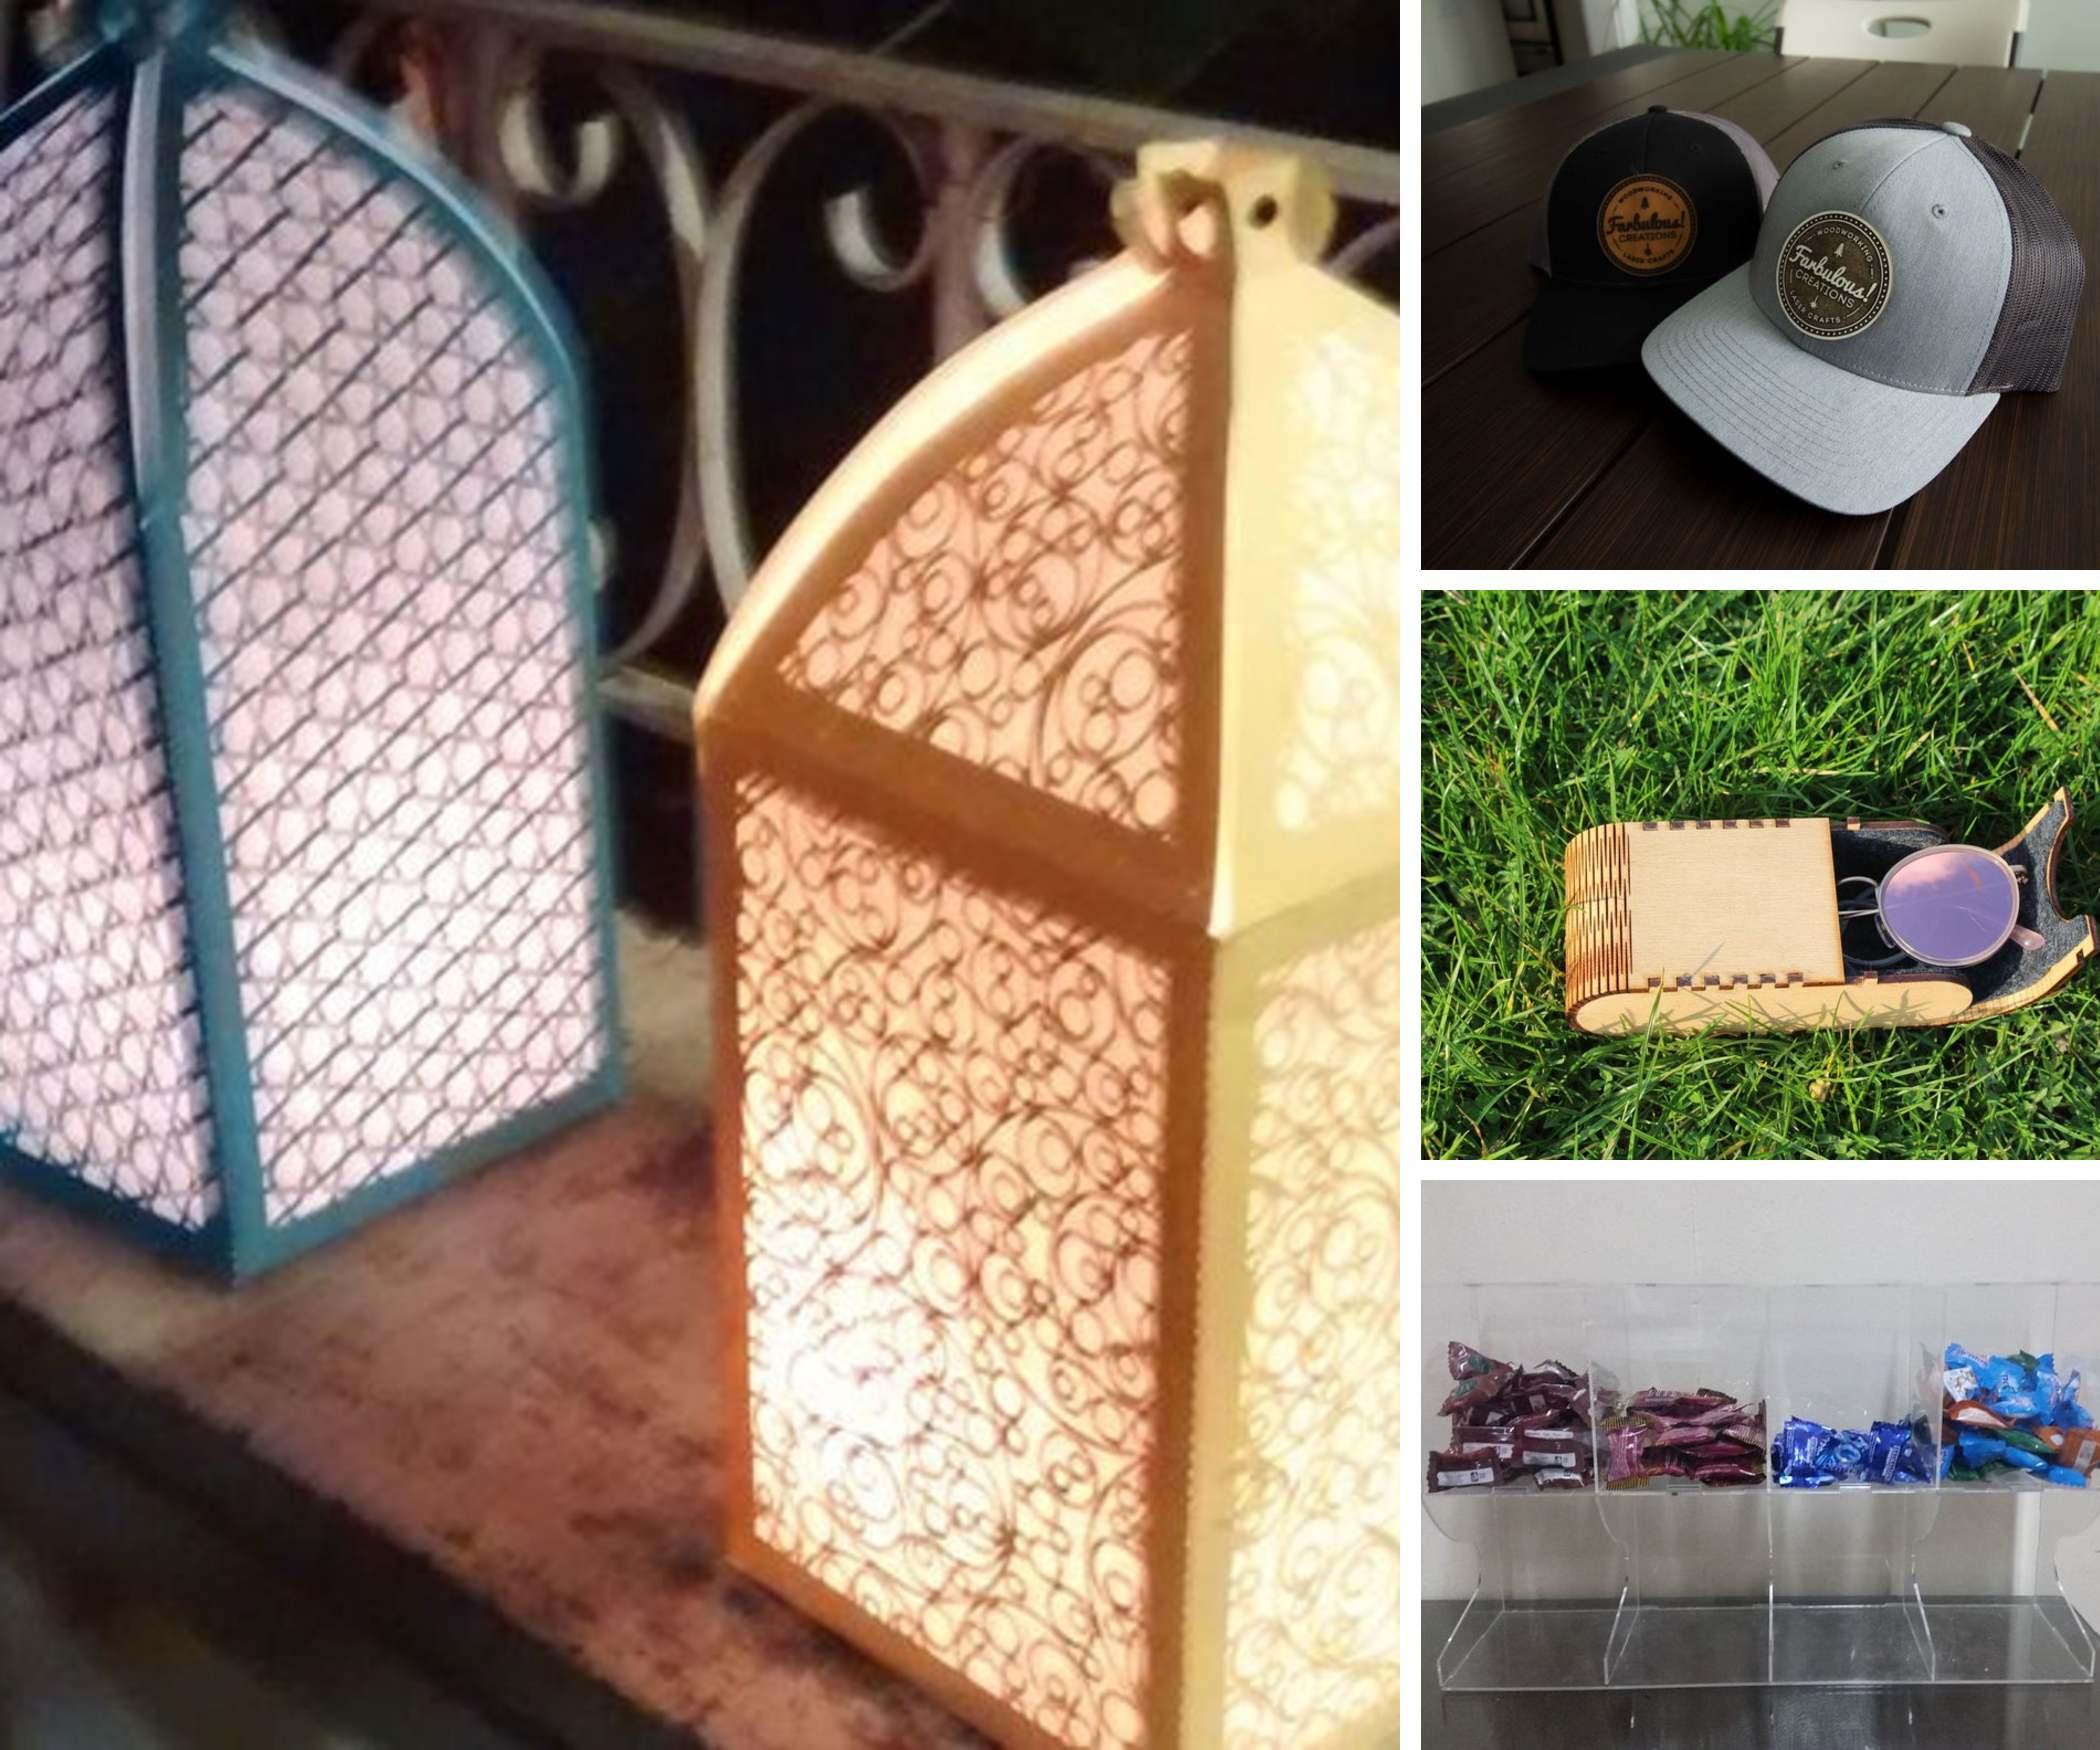 Project Ideas: Laser Cutter